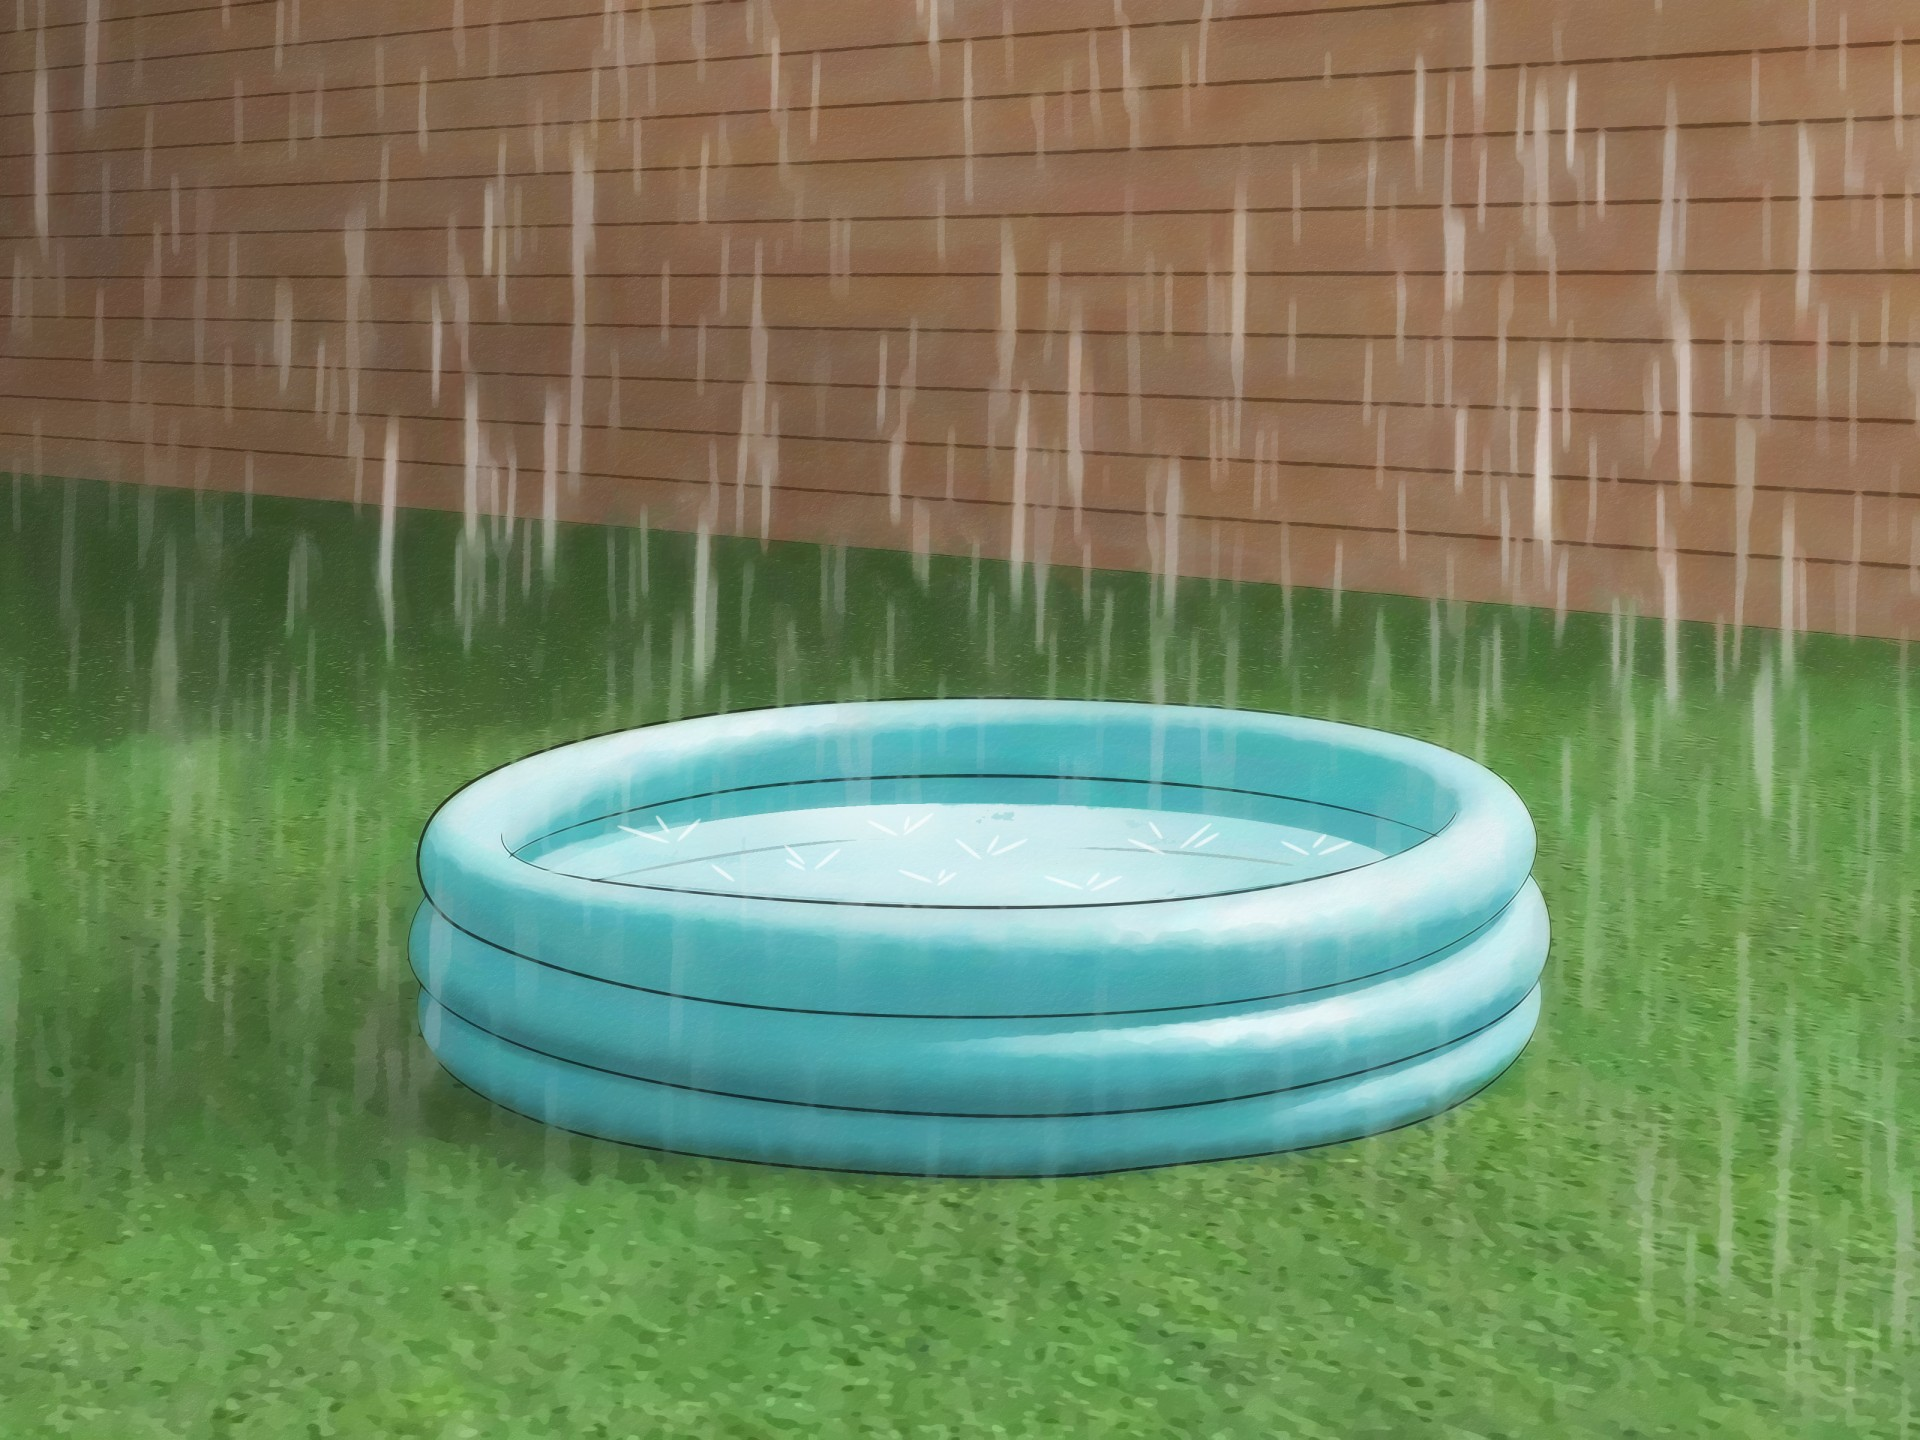 023 2439369275 Rainwater Harvesting Essay Wikipedia Save Water Awful Life In Tamil Gujarati 1920